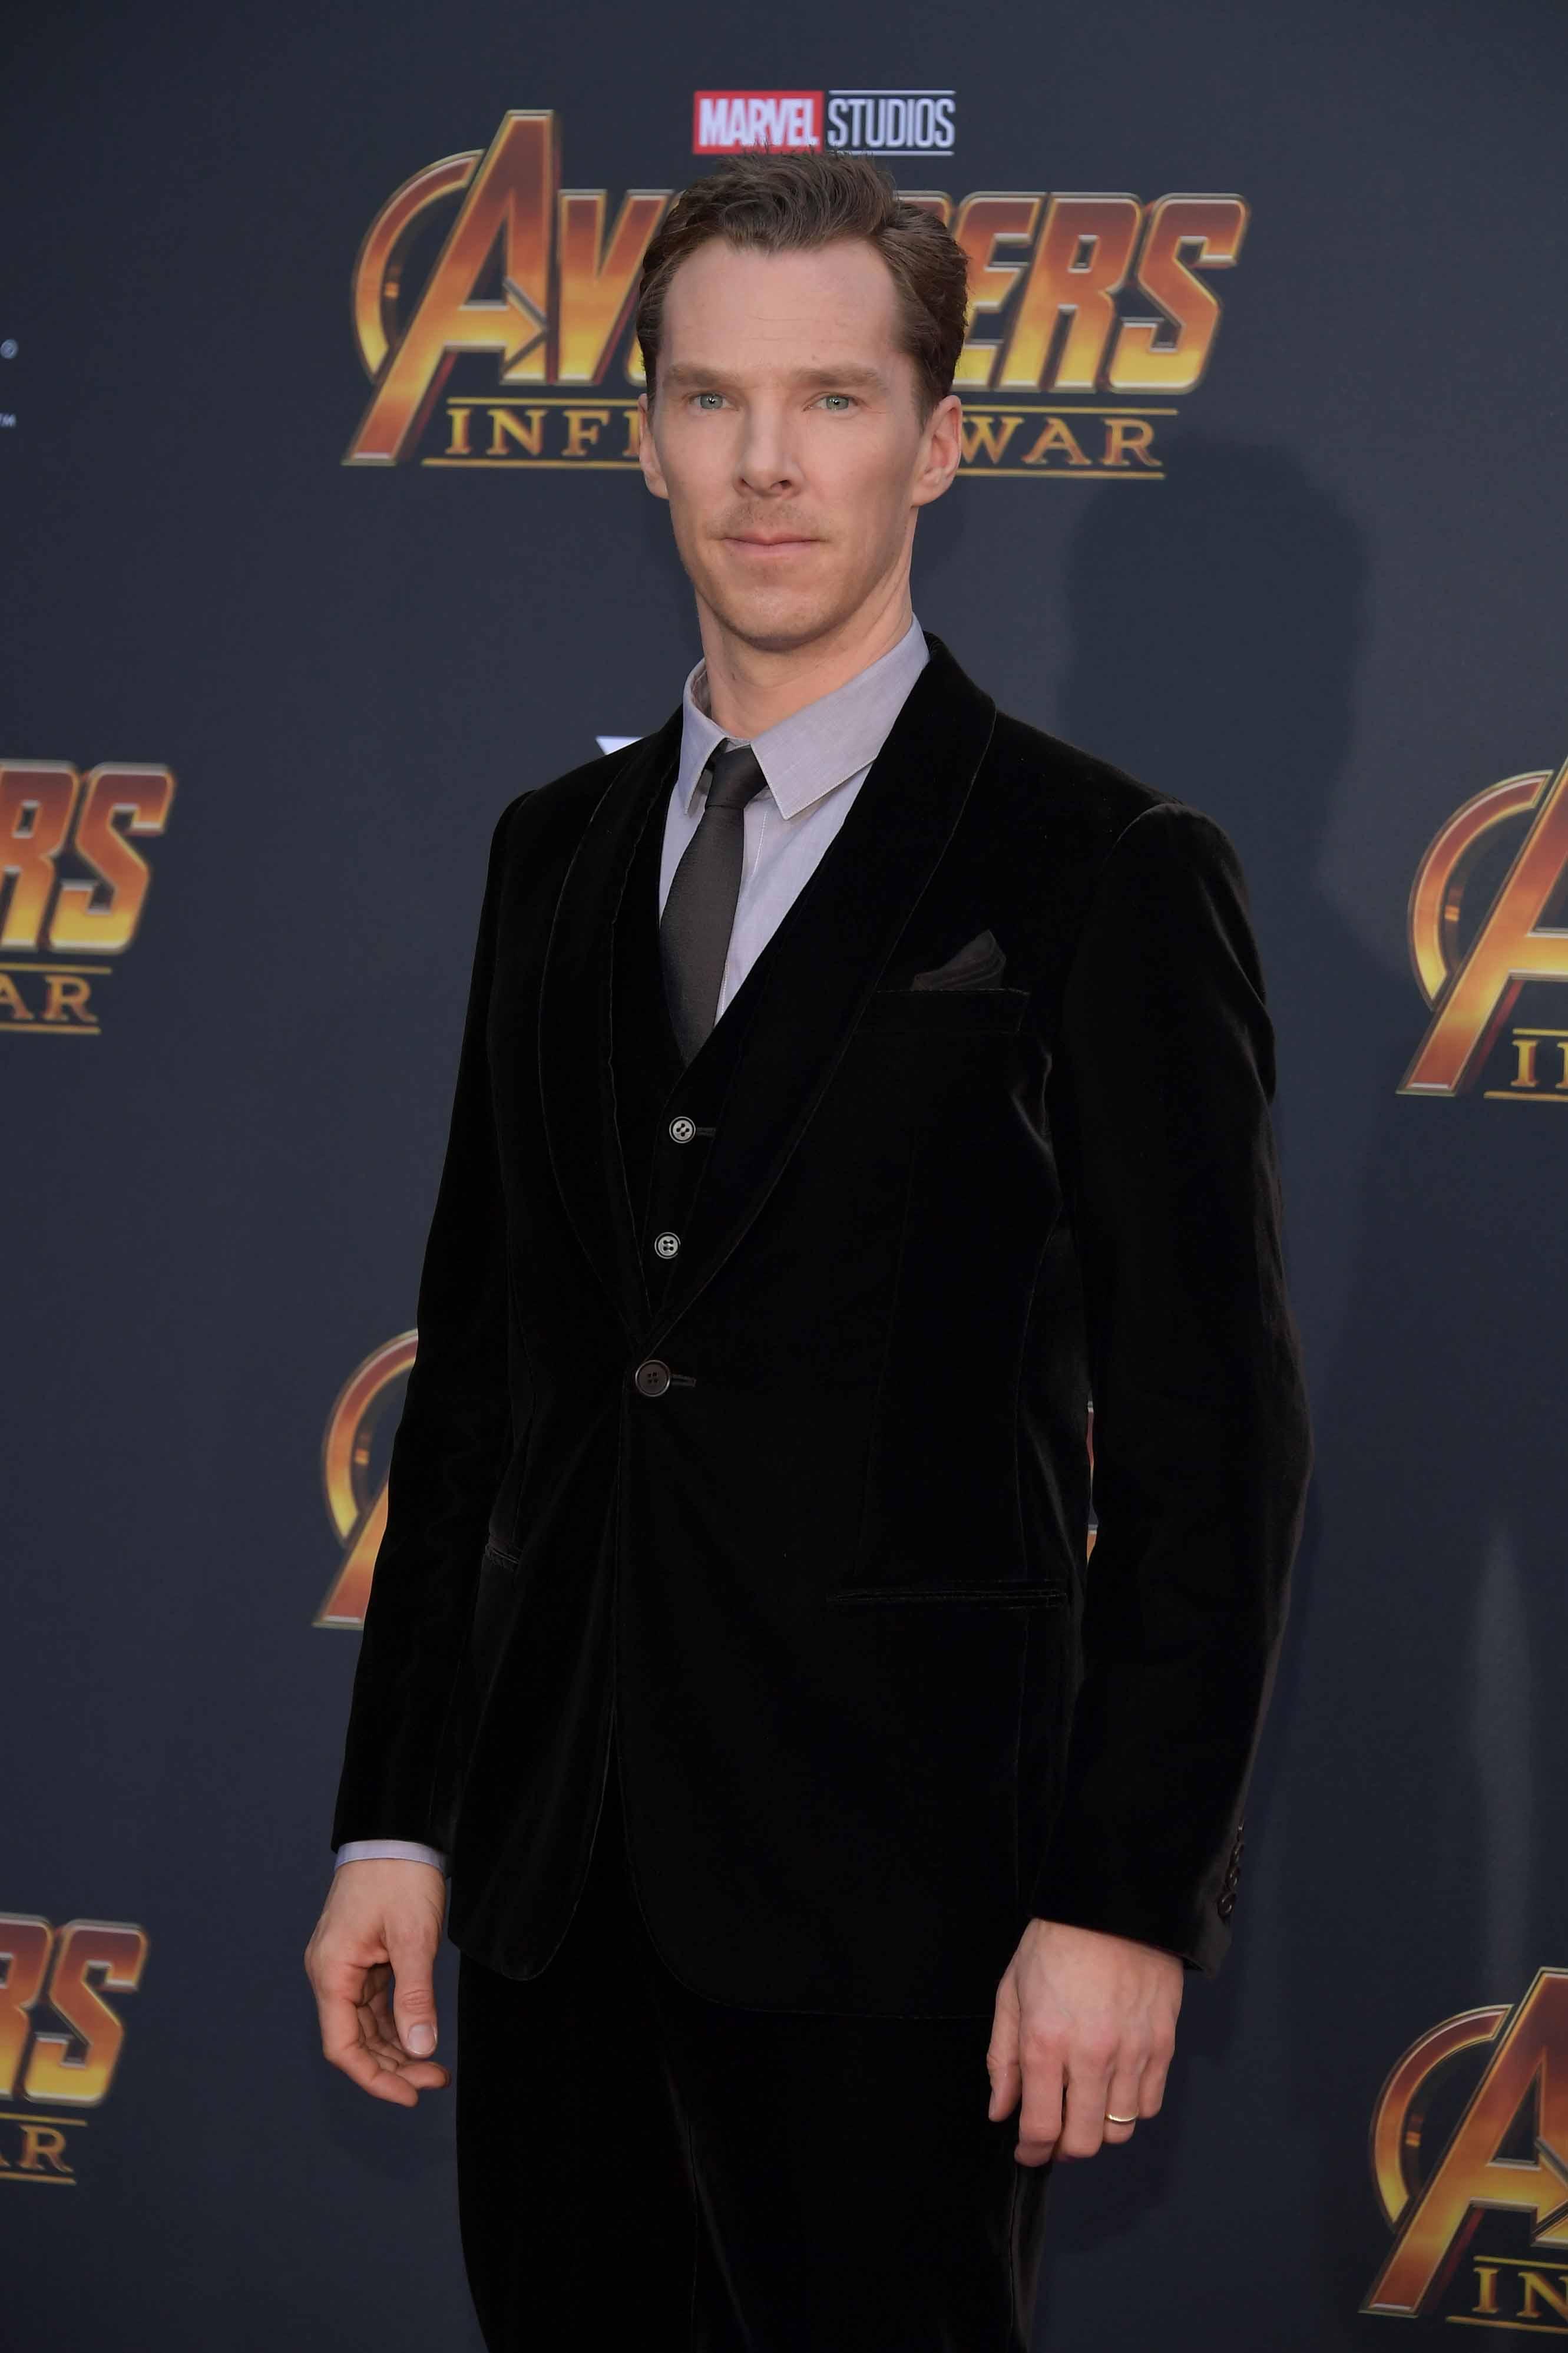 benedict cumberbatch dons giorgio armani at avengers: infinity war